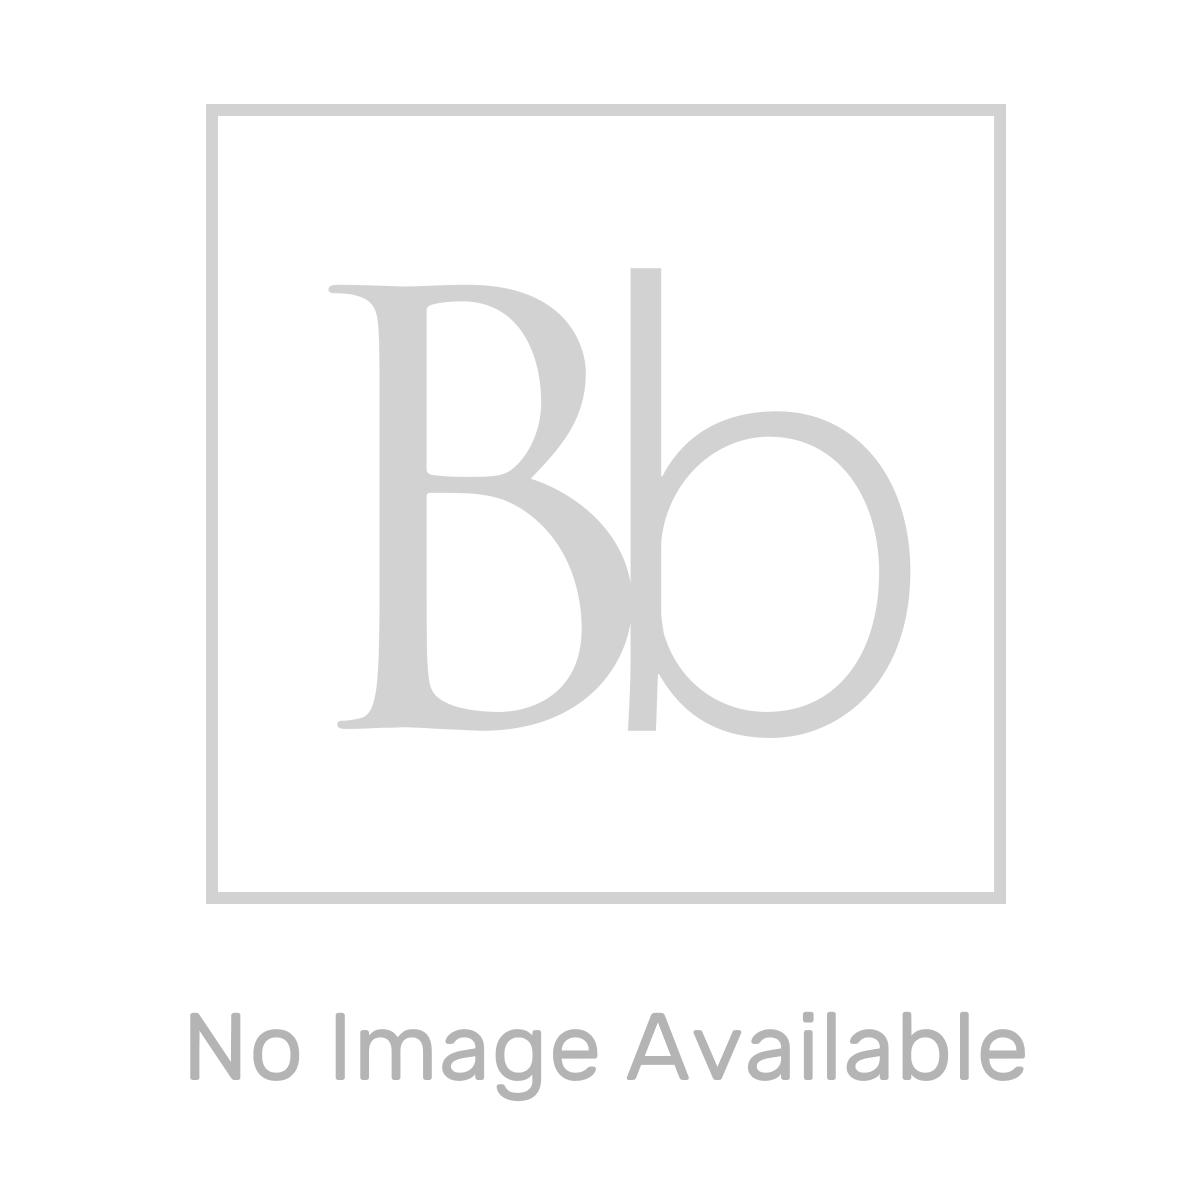 Aquadart Black Slate Shower Tray 1700 x 700 Overhead